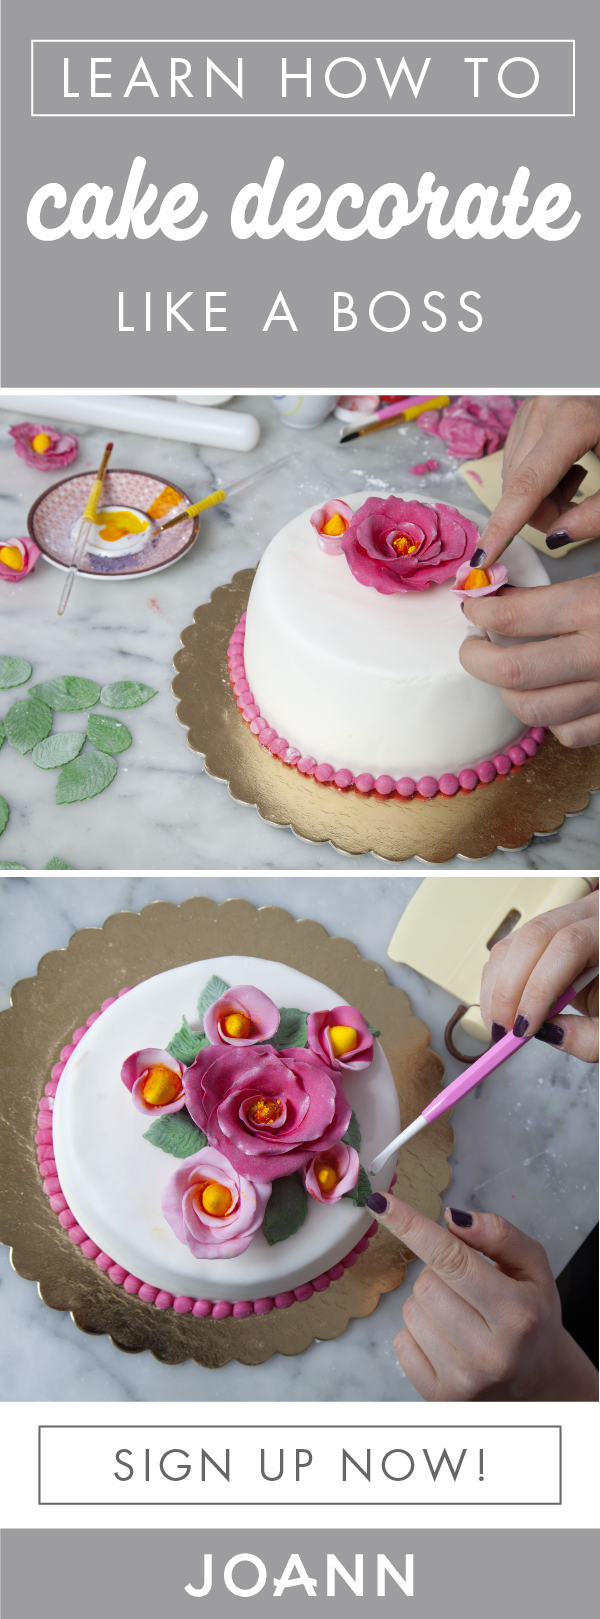 Joann Cake Decorating Class | Decoratingspecial.com